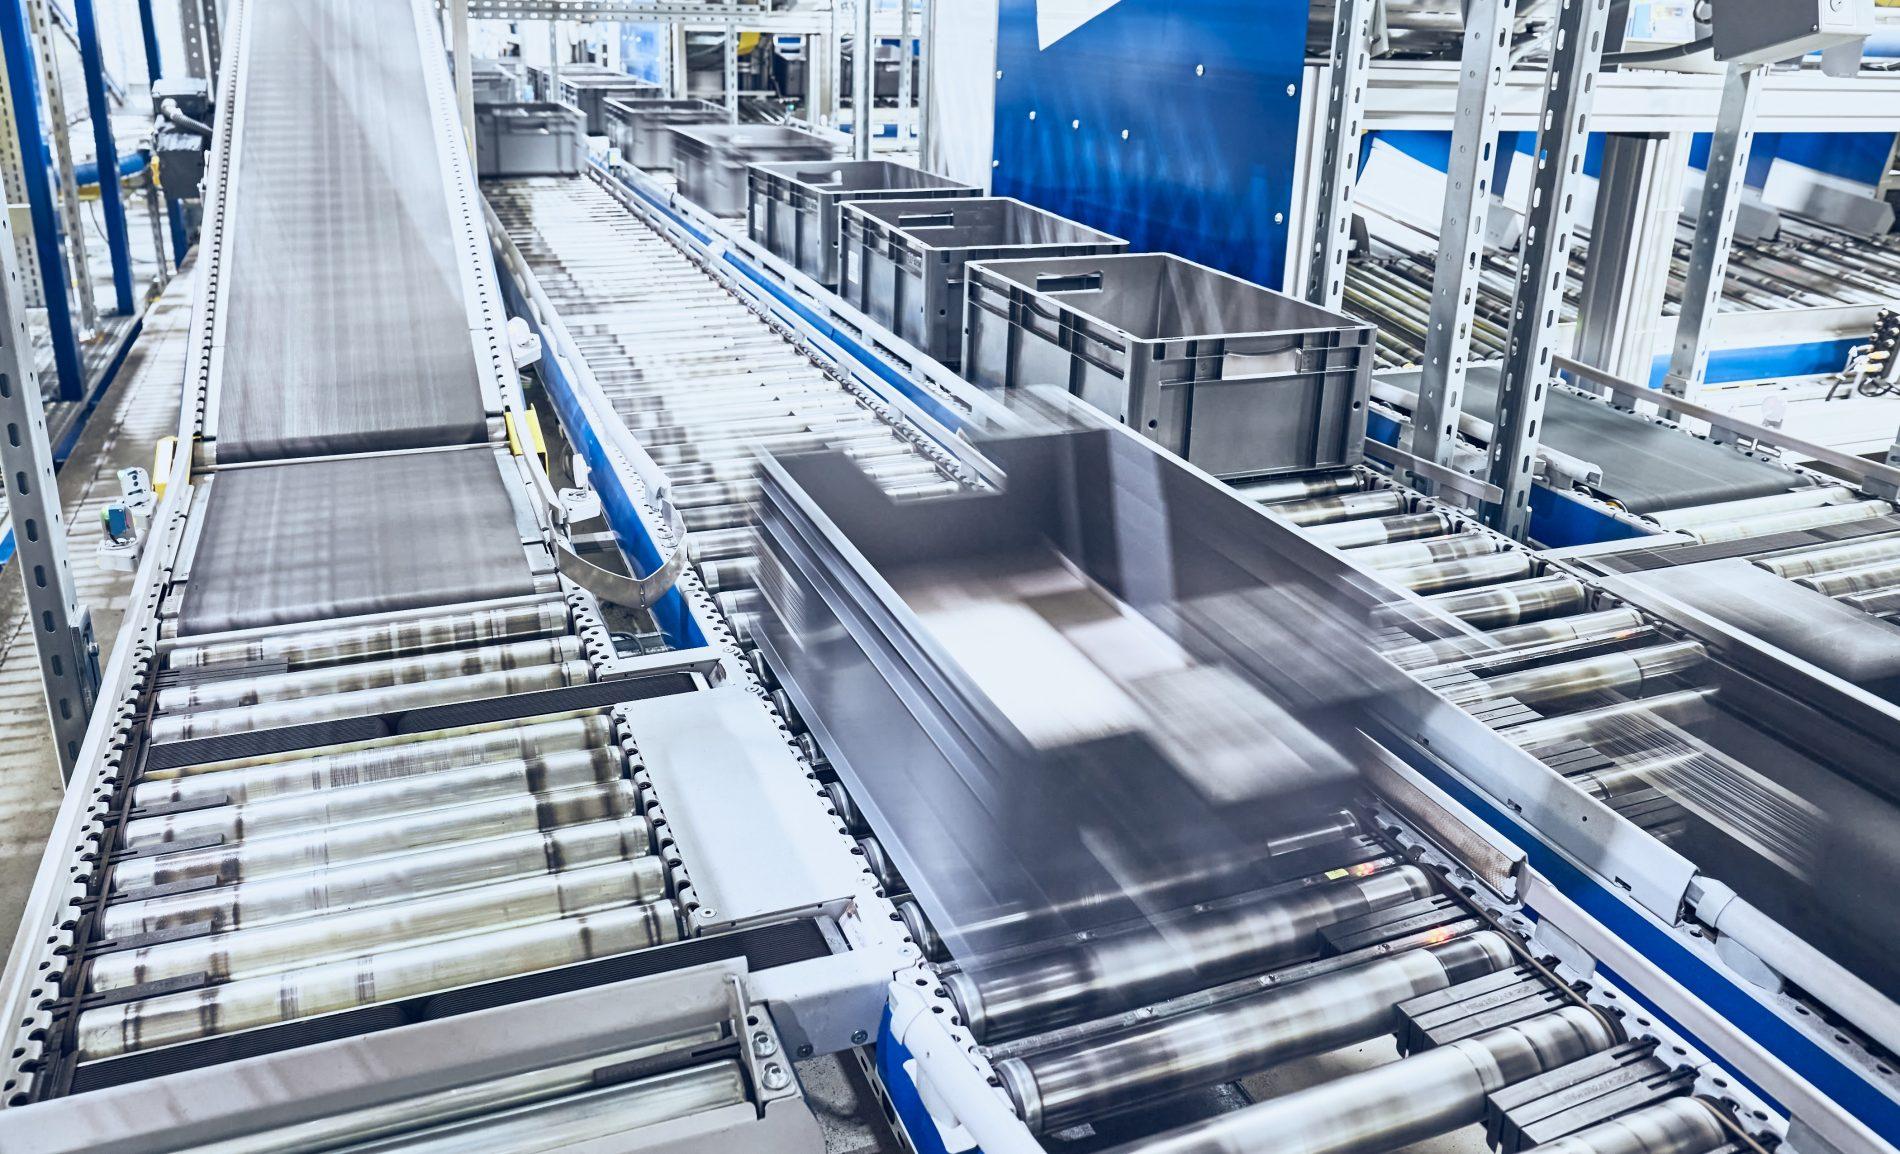 Lineaire Industrie Transport Distributie Pillen Group